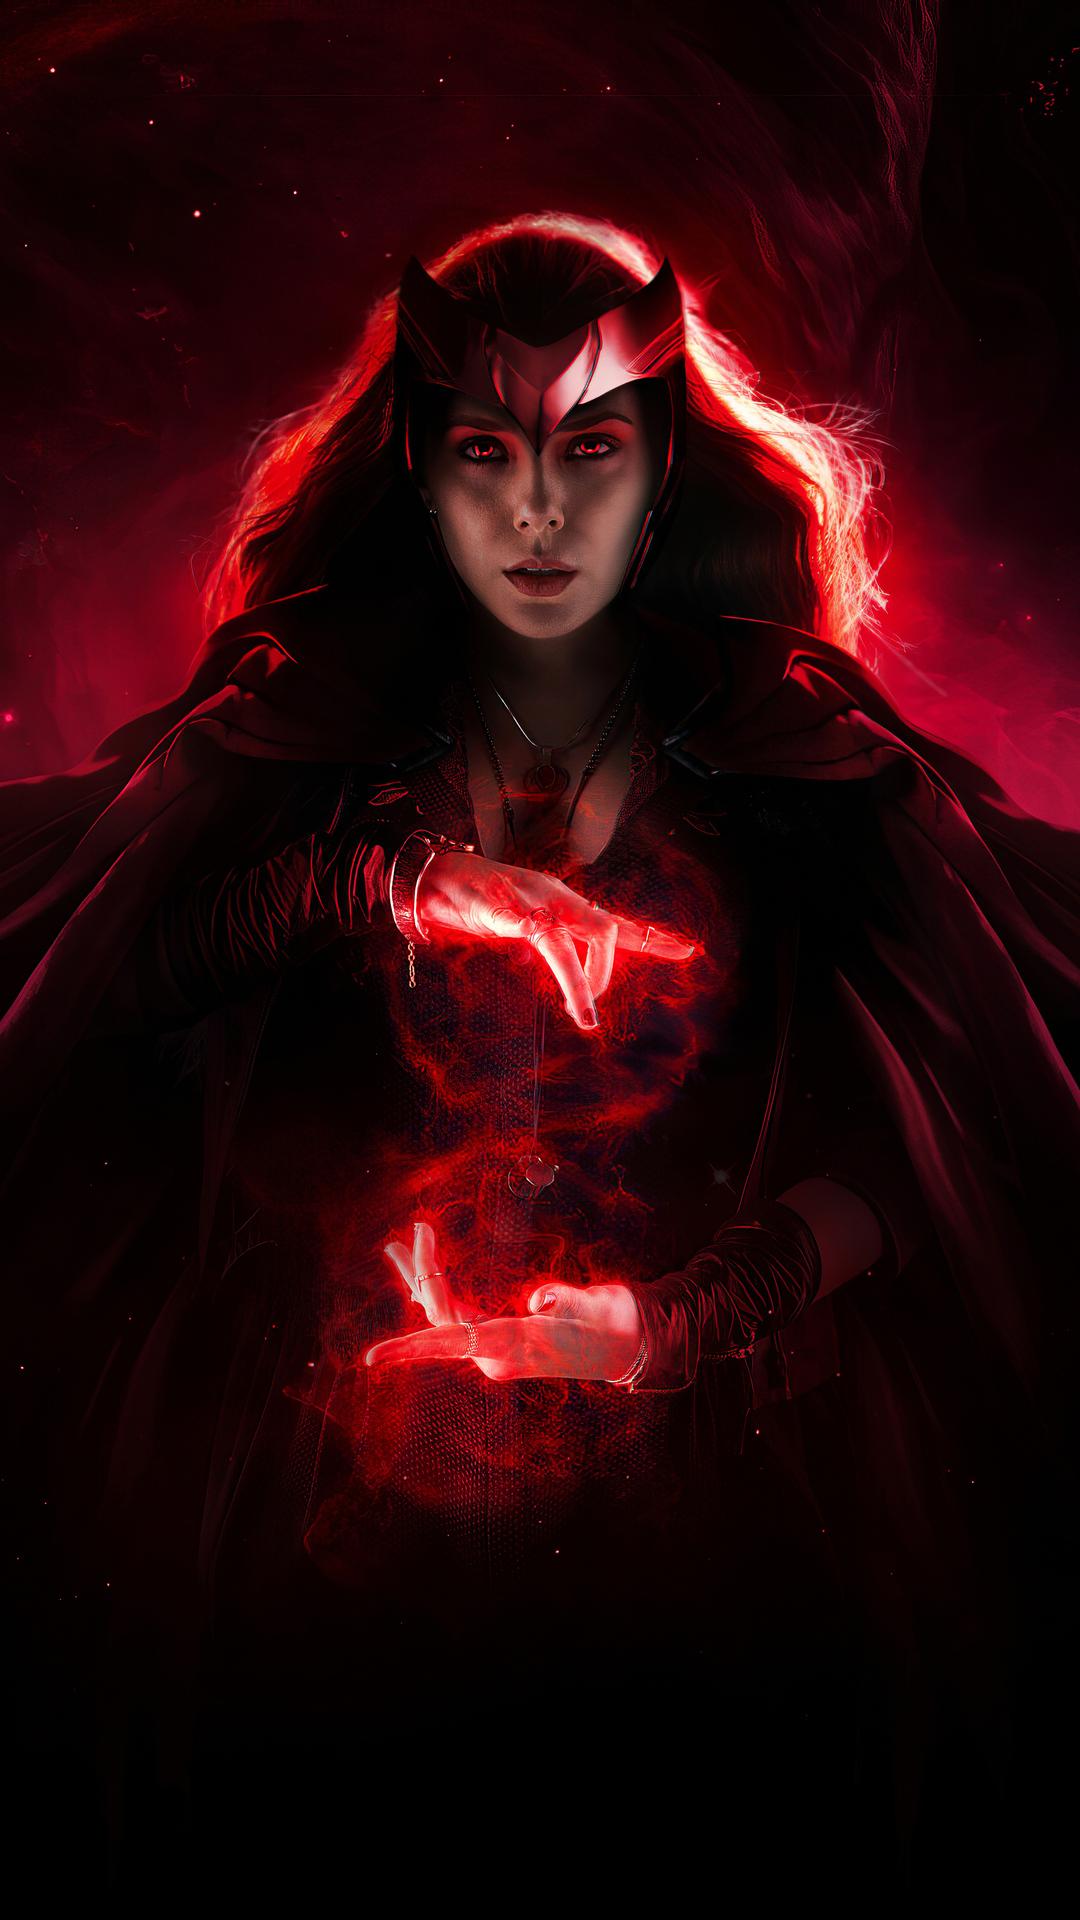 scarlet-witch-2020-4k-ze.jpg